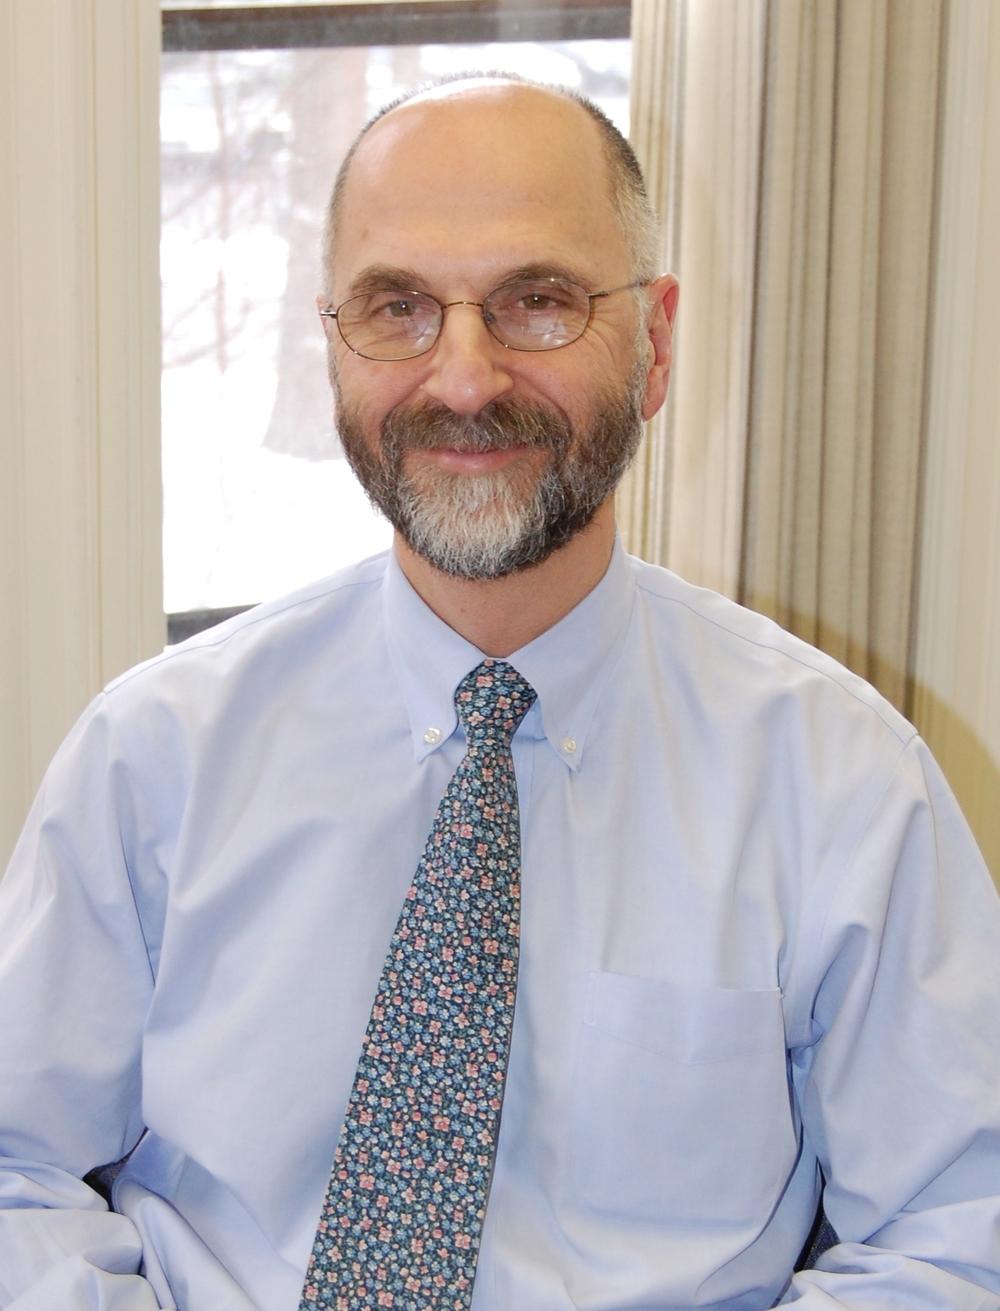 Dr. Joseph Friedman